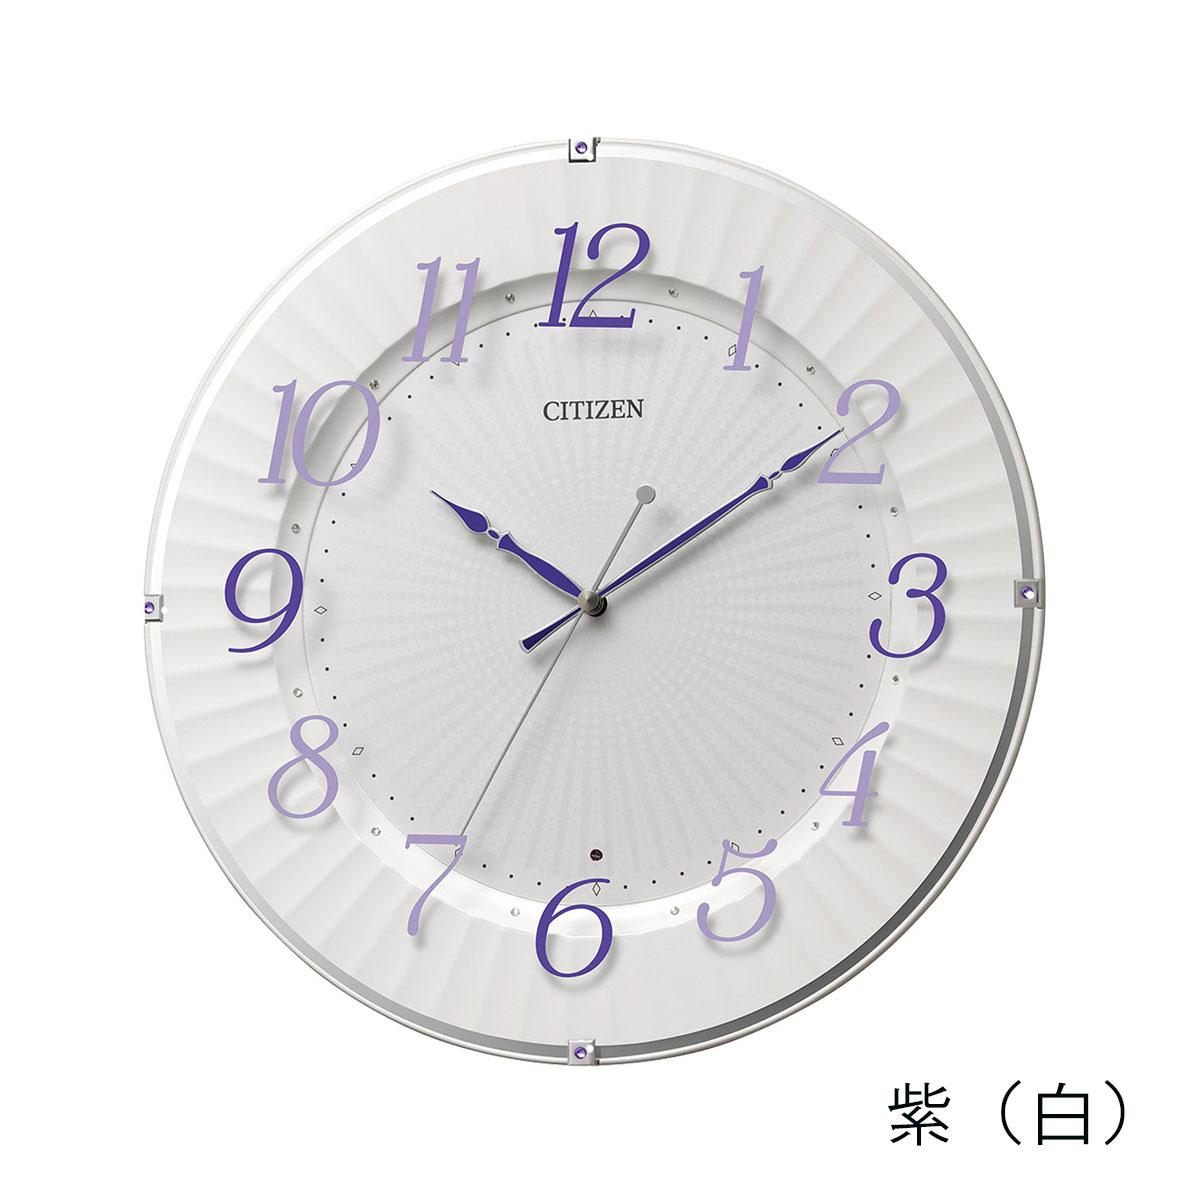 CITIZEN (シチズン) スタンダード掛時計 8MY537